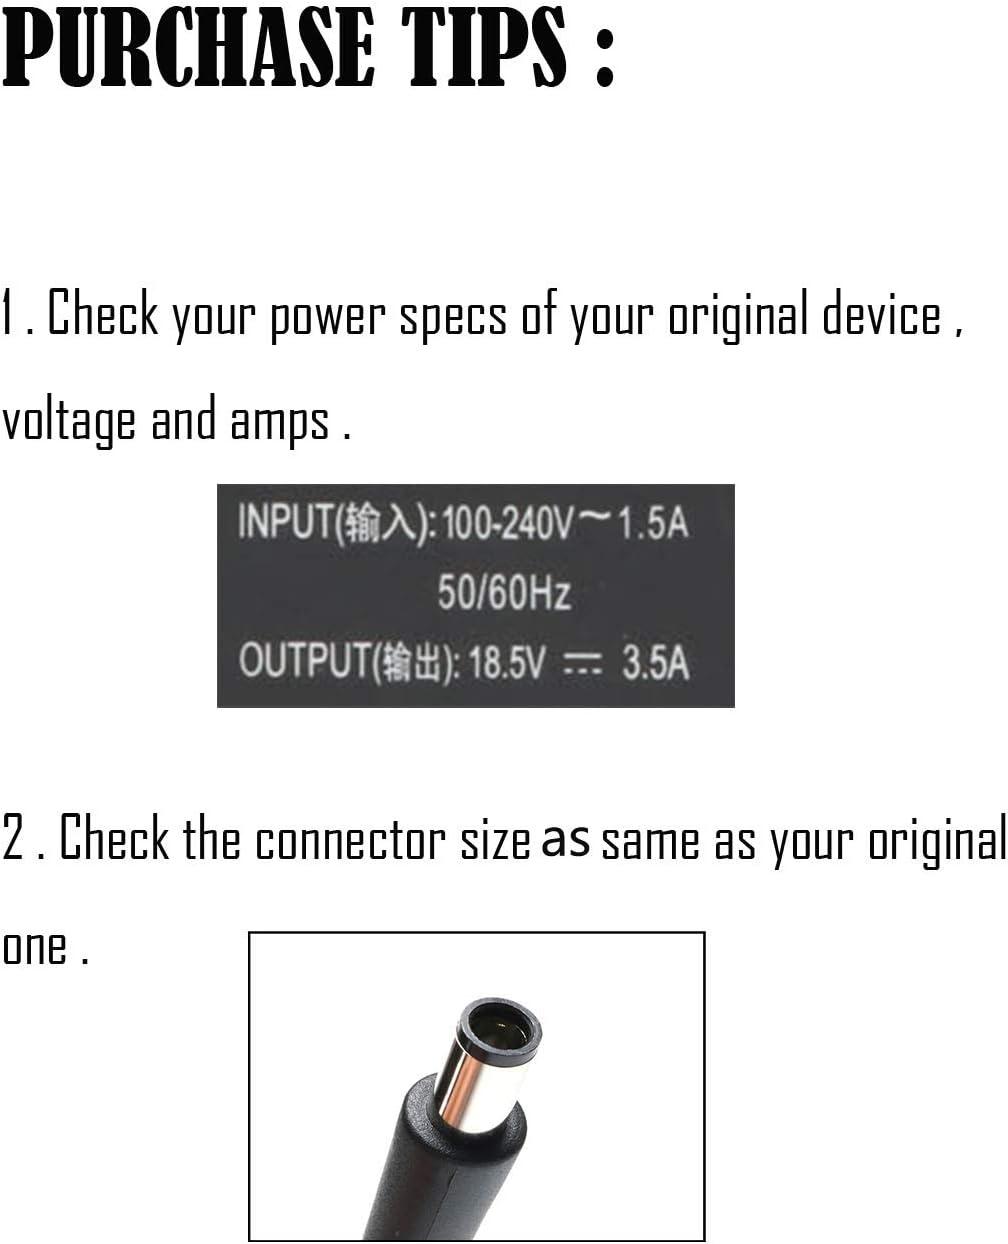 Ac Laptop Adapter Charger for HP 2000-2B09WM 2000-2A20NR Pavilion DV4 DM4 DV5 DV6 DV7 G60 18.5V 3.5A 65w